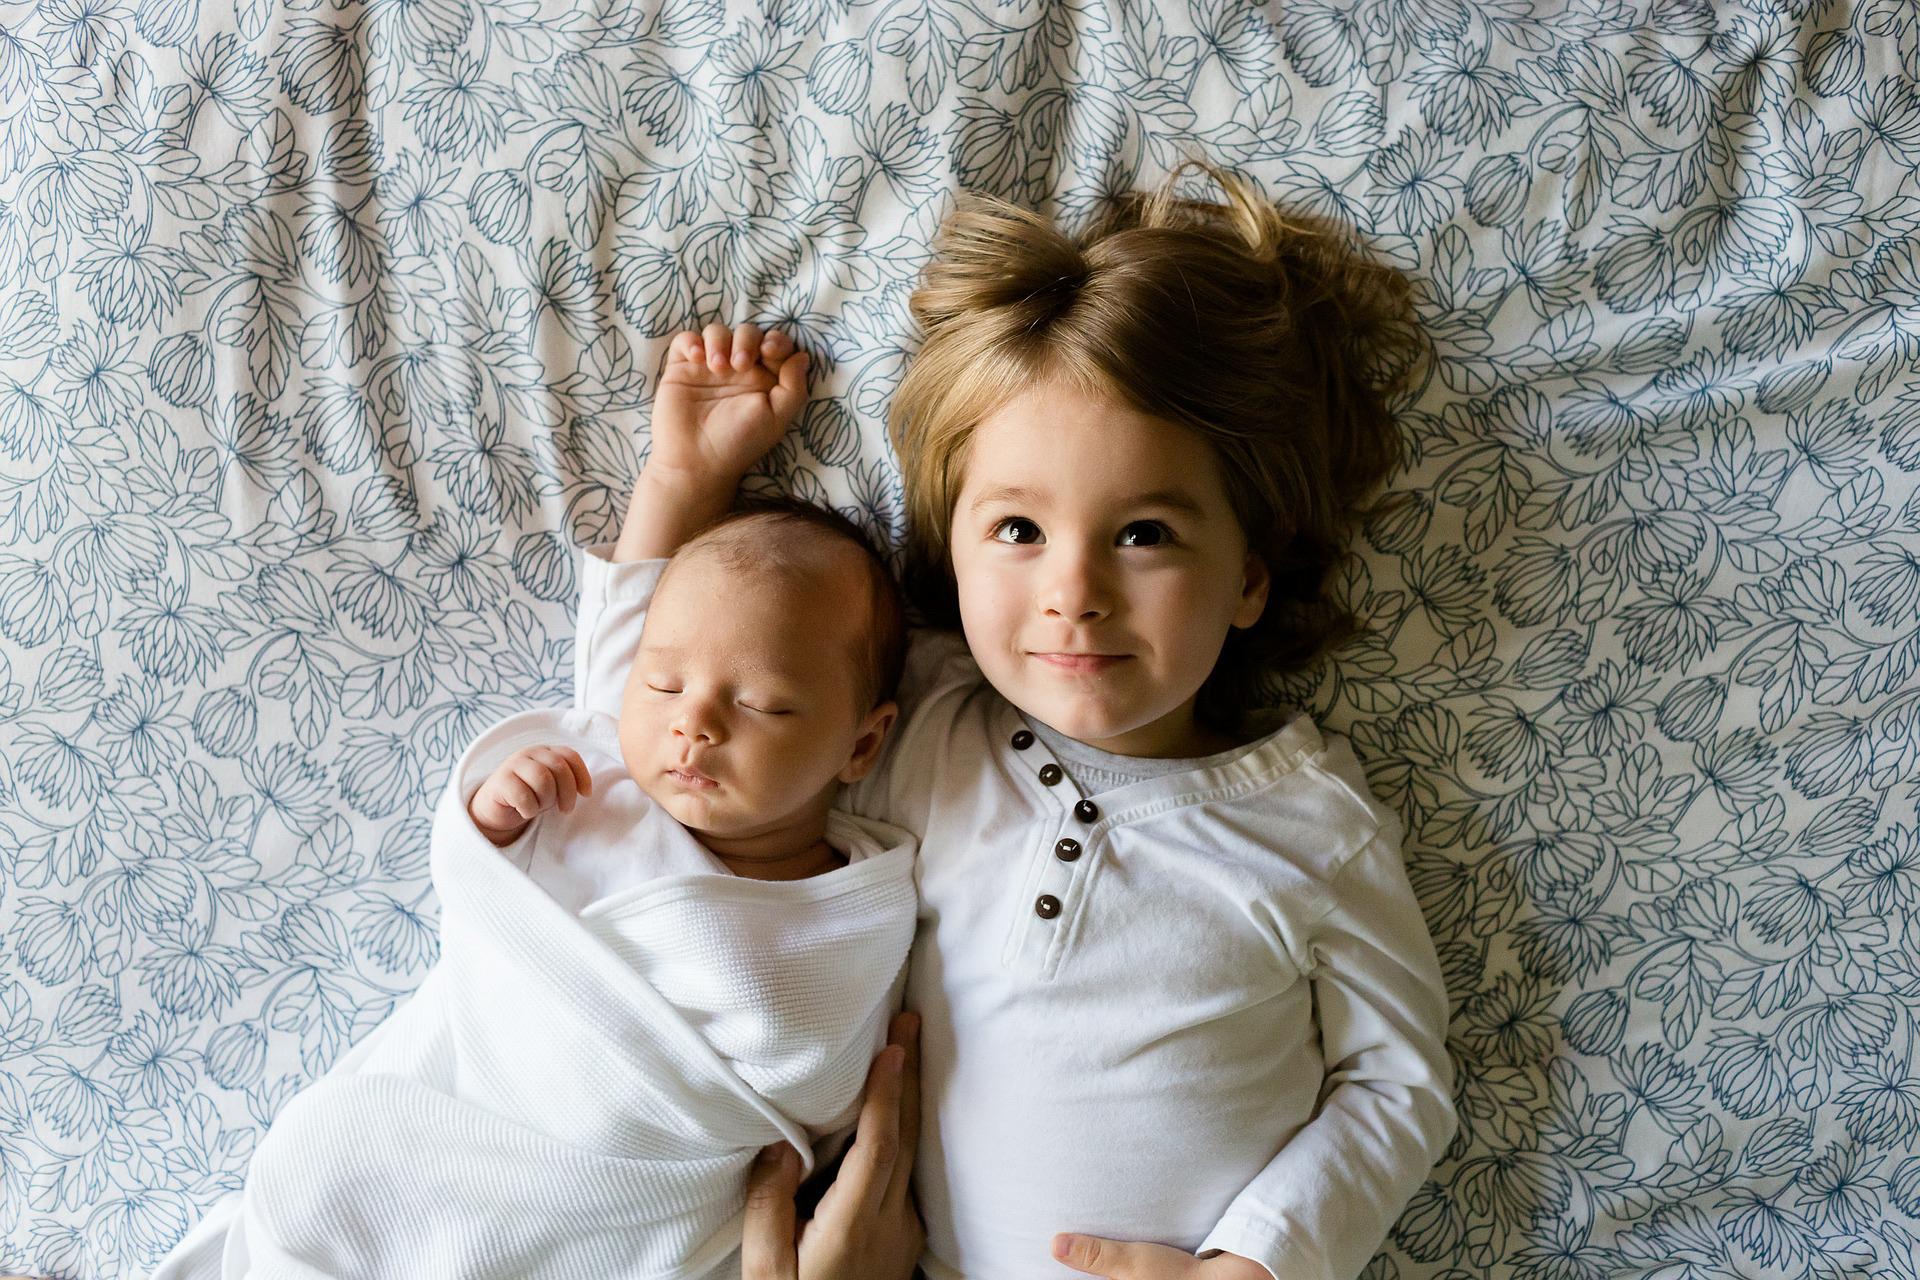 lifestyle newborn photography tips - photojaanic -6